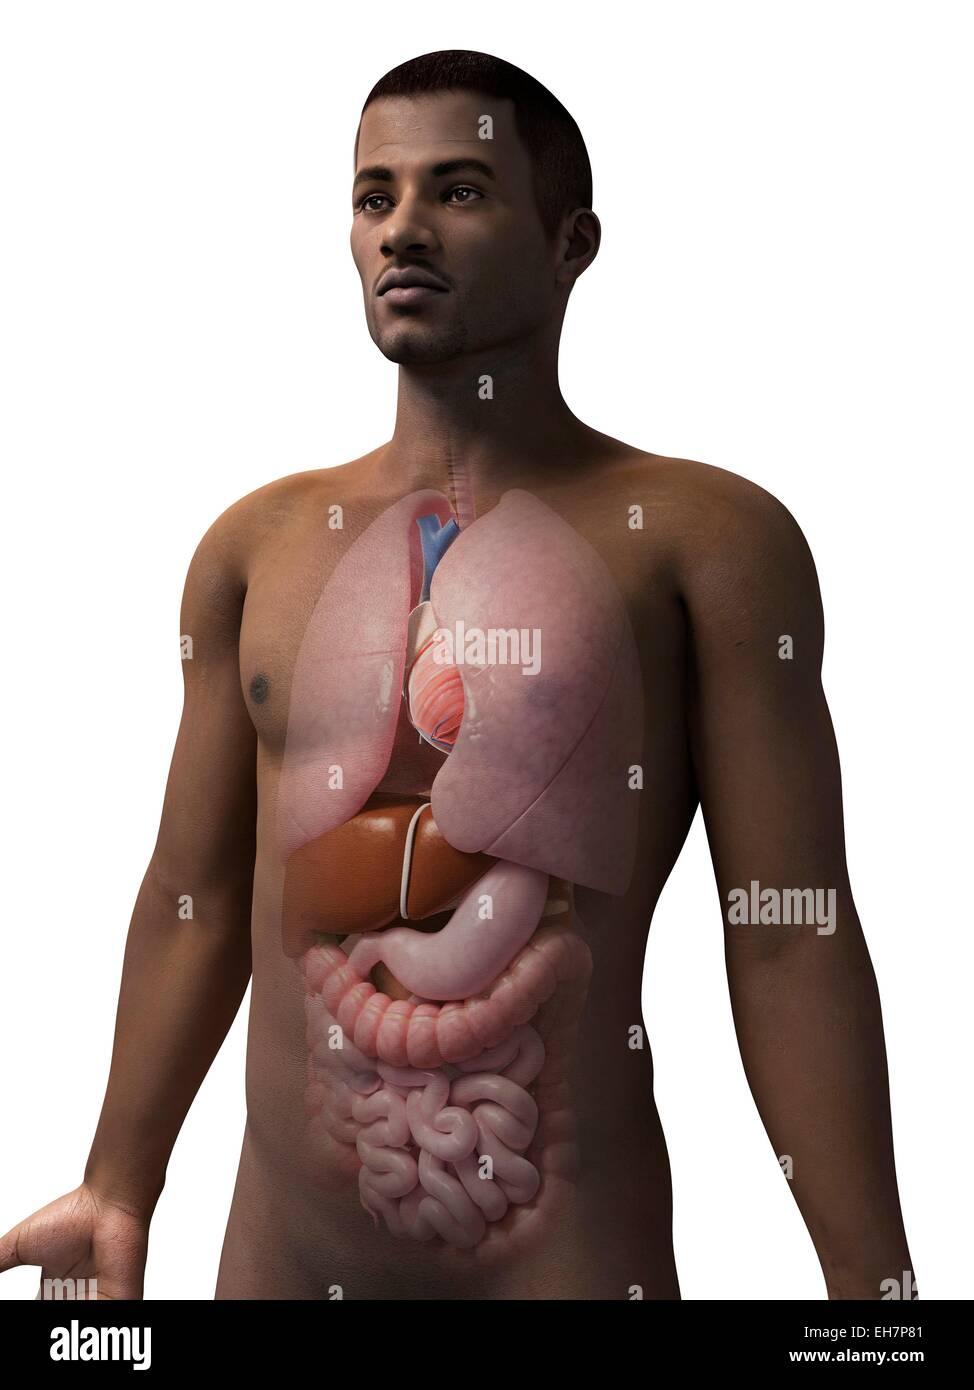 Male Internal Organs Stock Photos & Male Internal Organs Stock ...